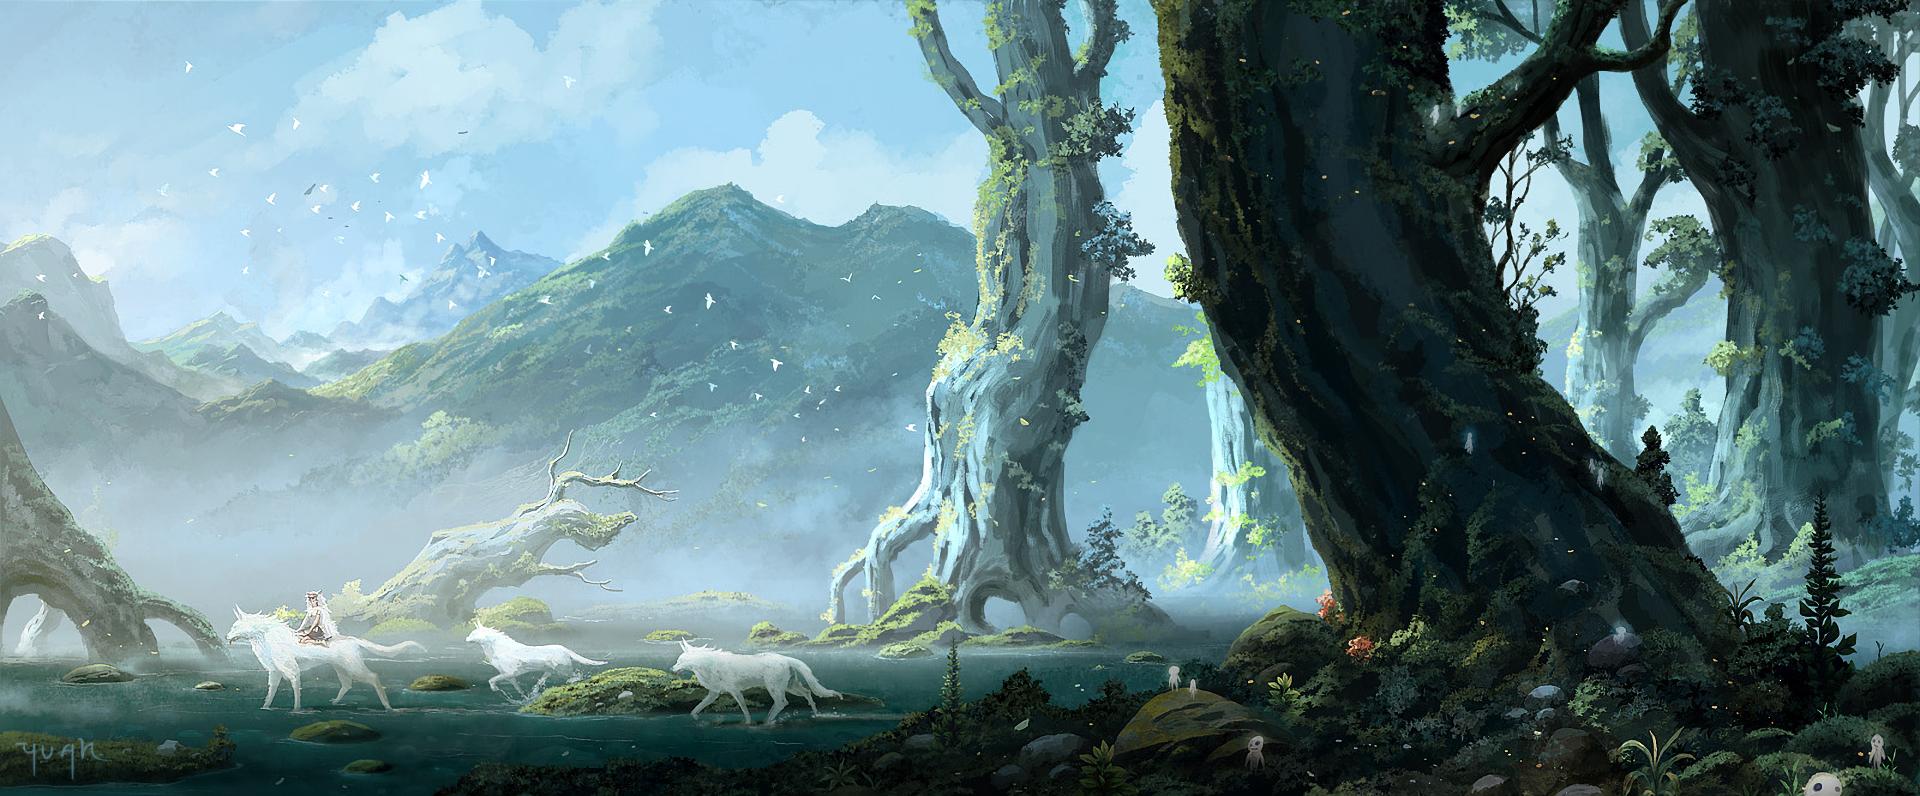 Princess Mononoke Wallpaper and Background Image ...